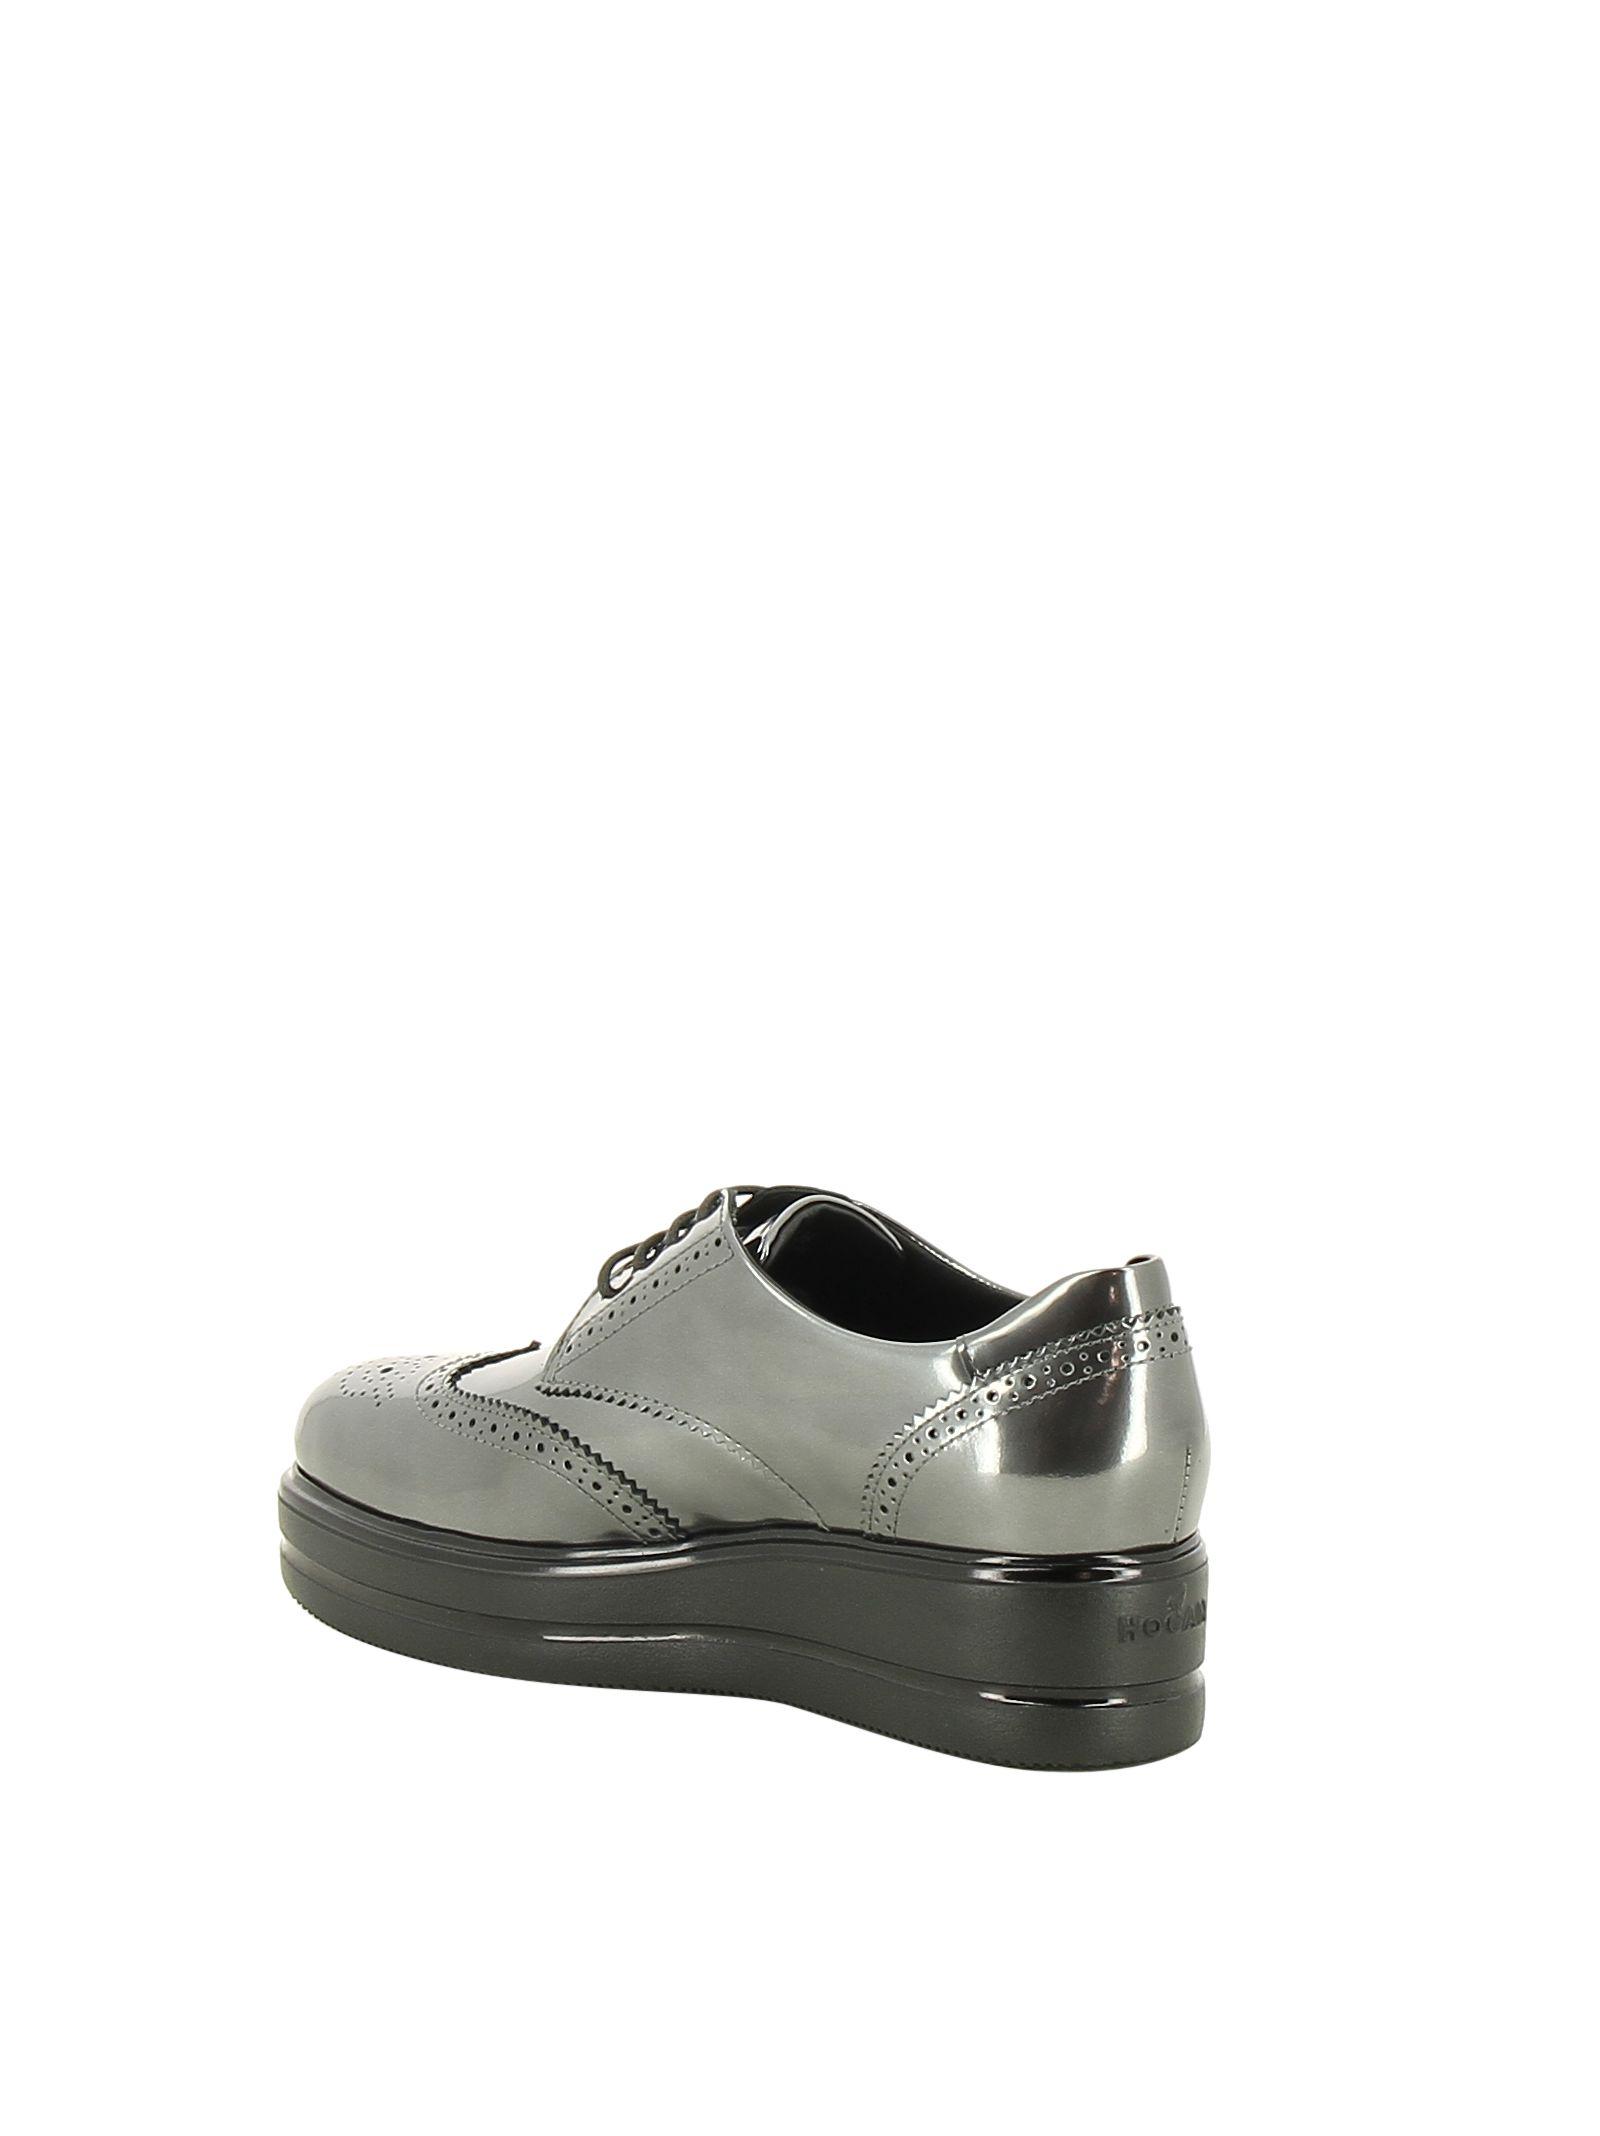 Hogan Platform derby shoes